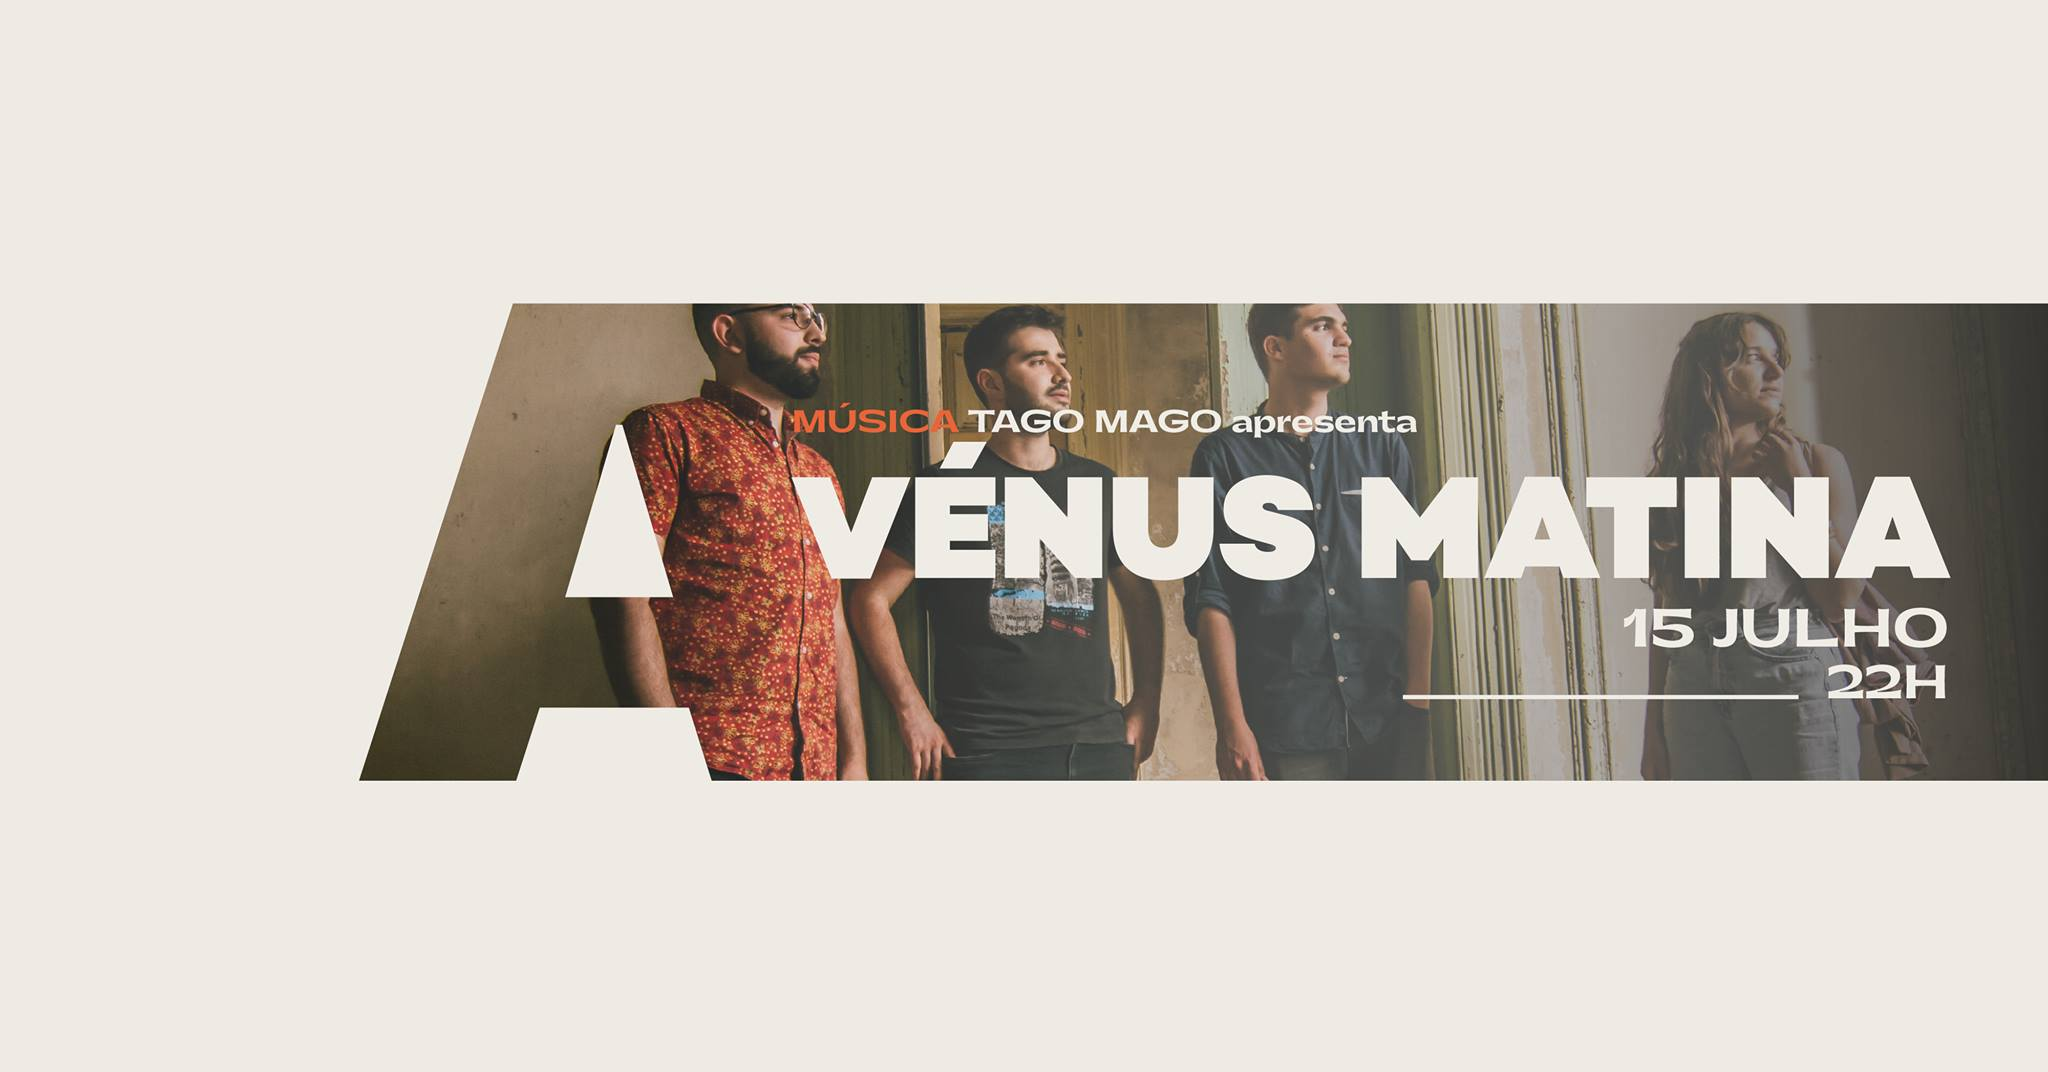 Vénus Matina no Avenida Café-Concerto